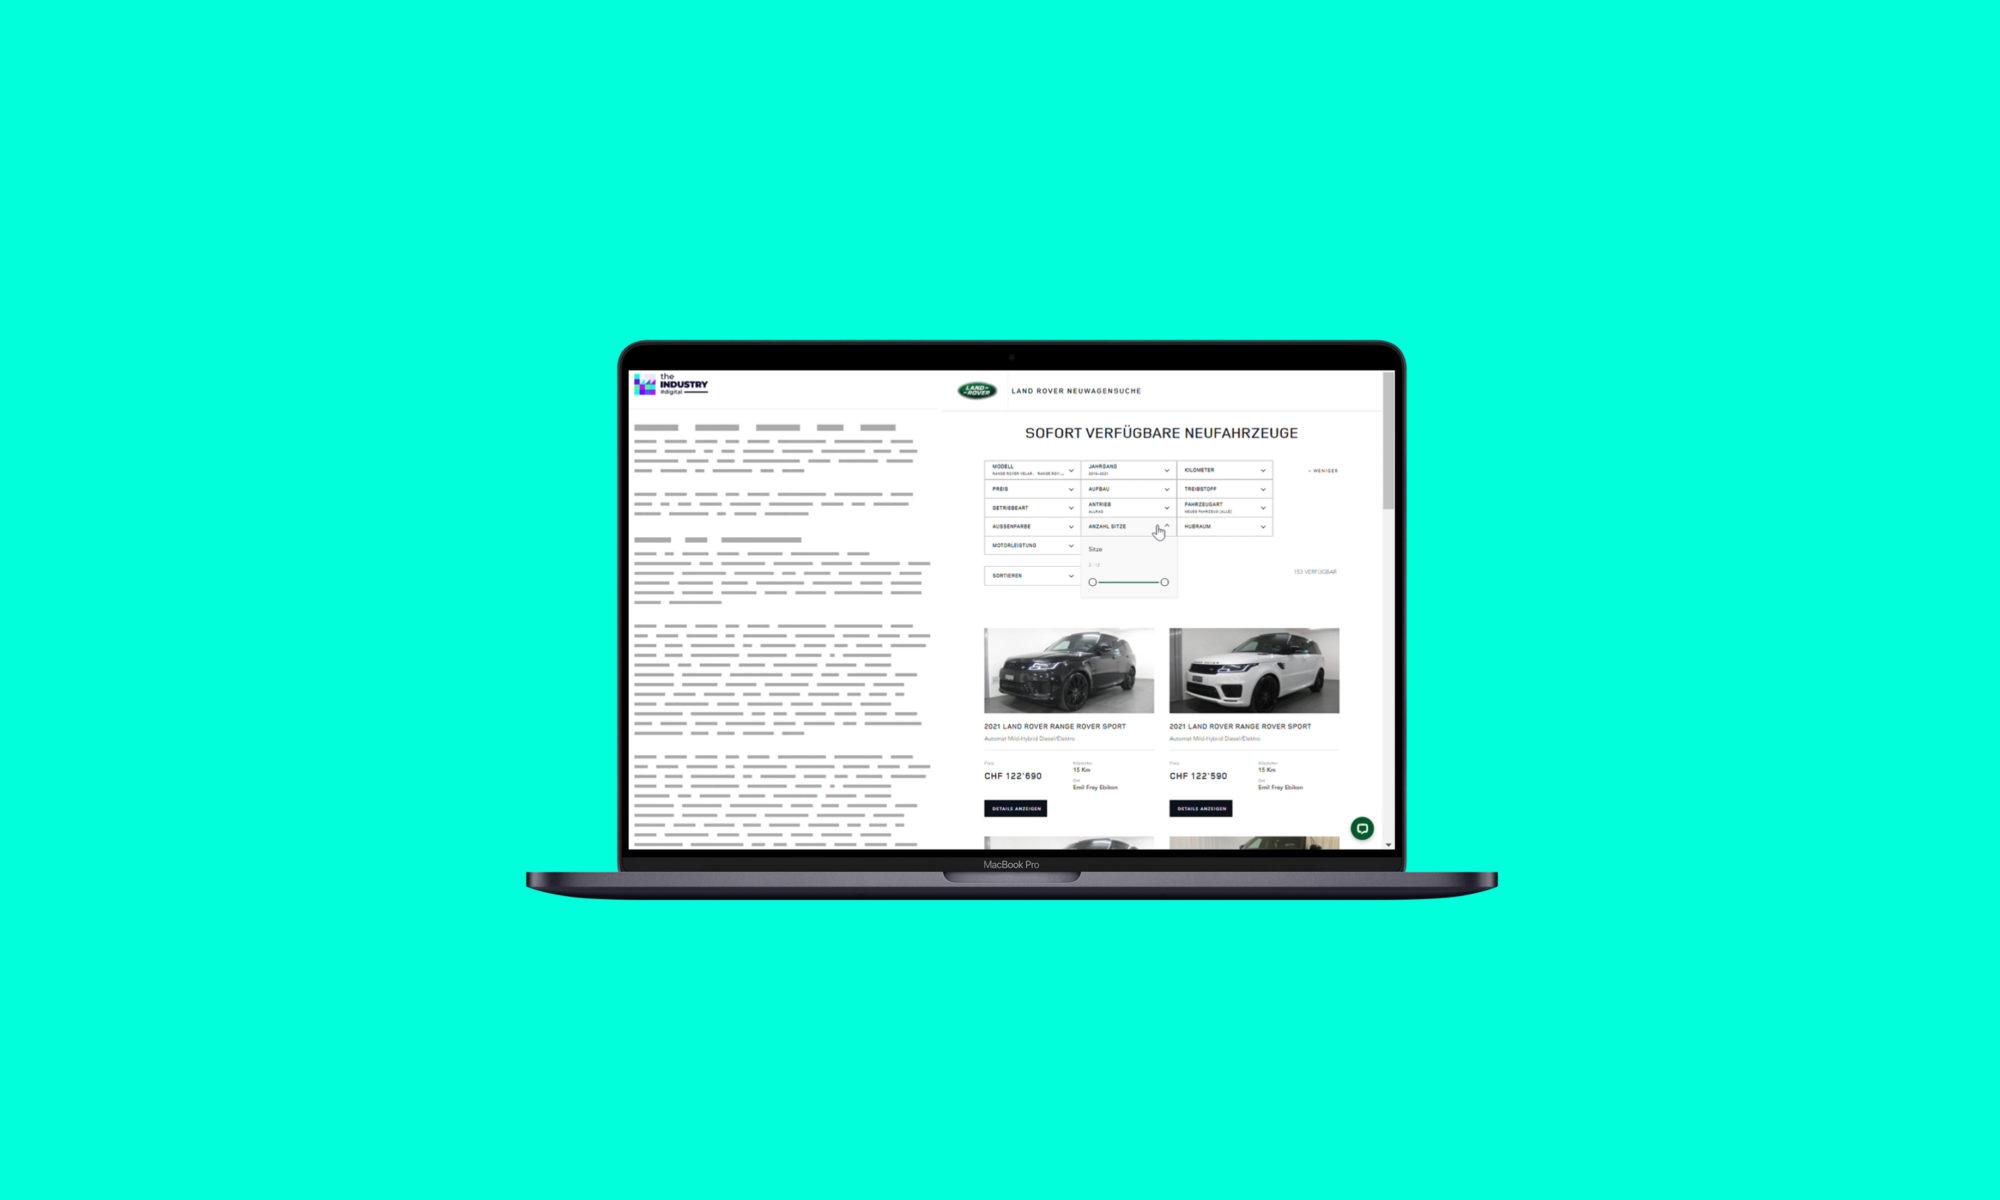 Jaguar_Range_Rover_Sitebar